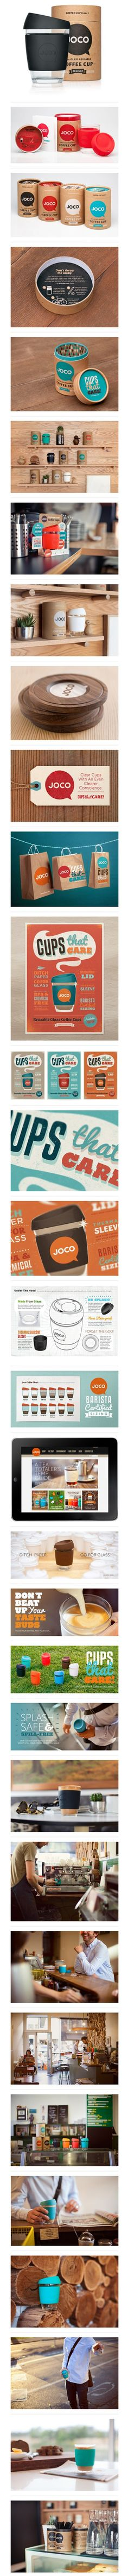 JOCO #packaging #branding #marketing PD